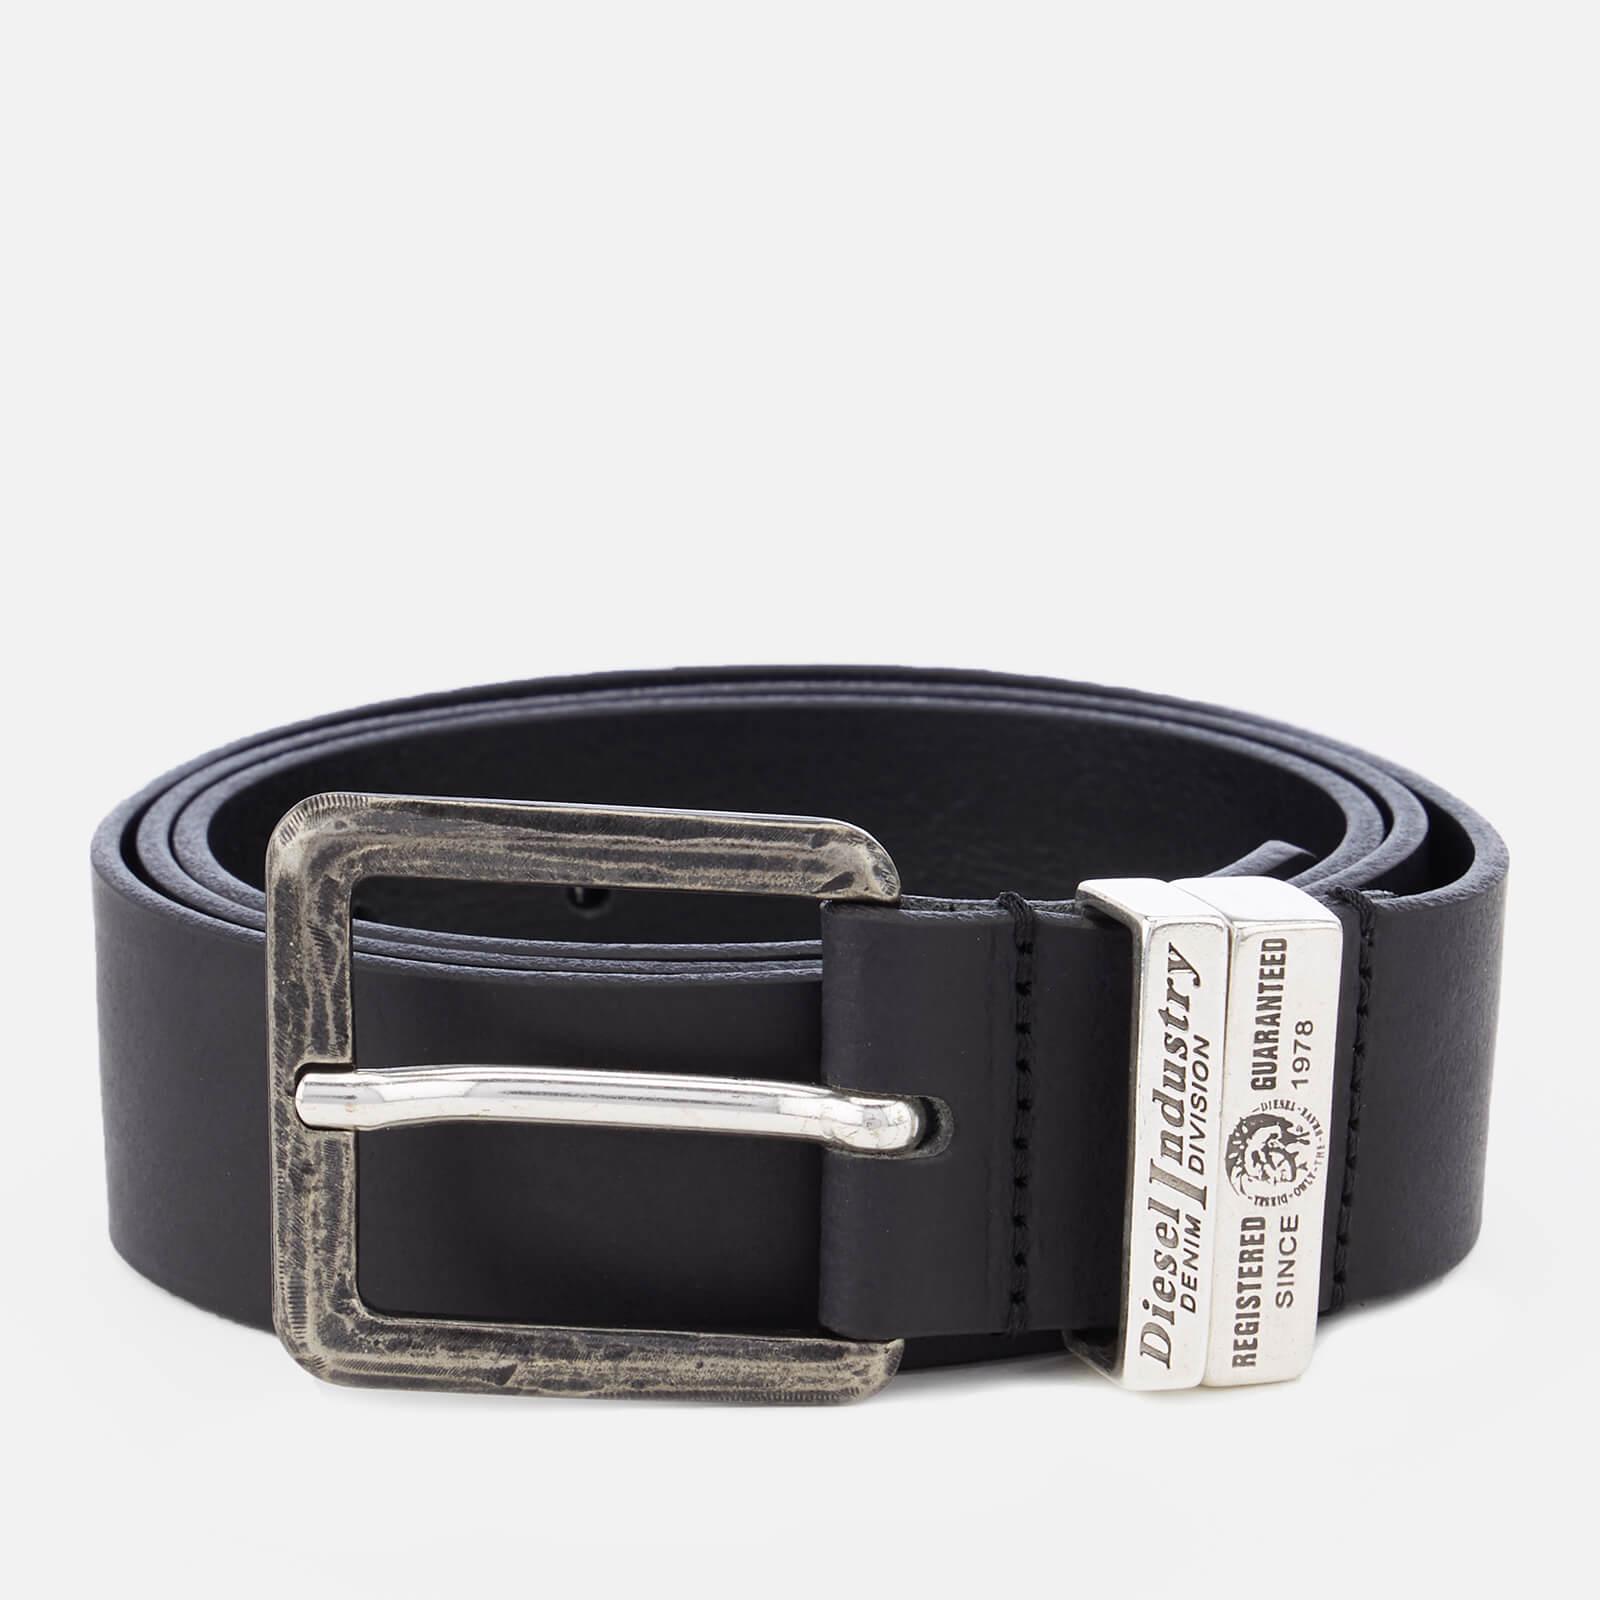 Diesel Men's Guarantee Leather Belt - Black - W42/105cm - Black